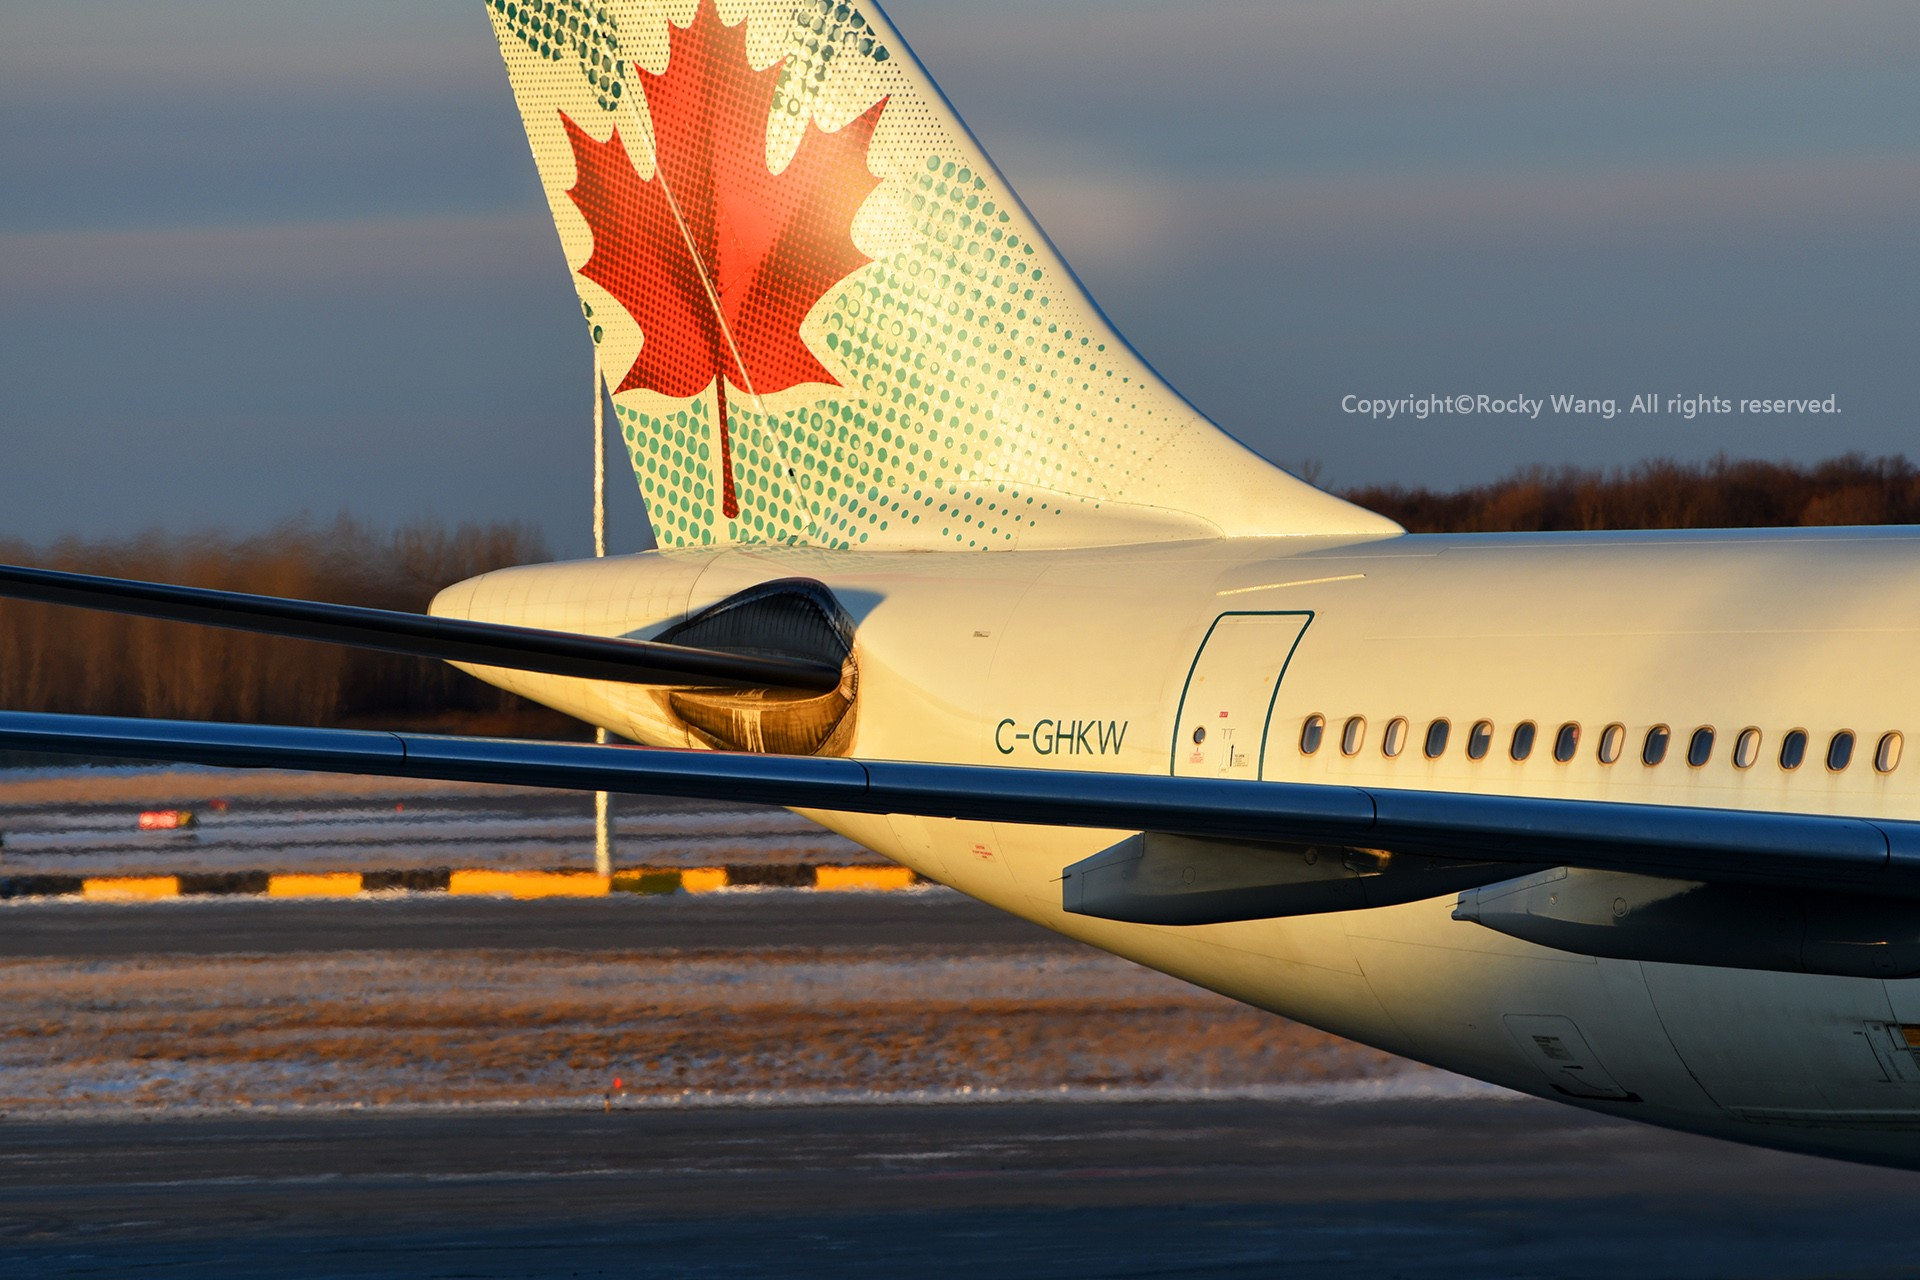 Re:[原创]简易版游记,纪念一次30段的环球飞行和一些碎碎念 AIRBUS A330-343 C-GHKW Montreal Pierre Elliott Trudeau Int'l Ai